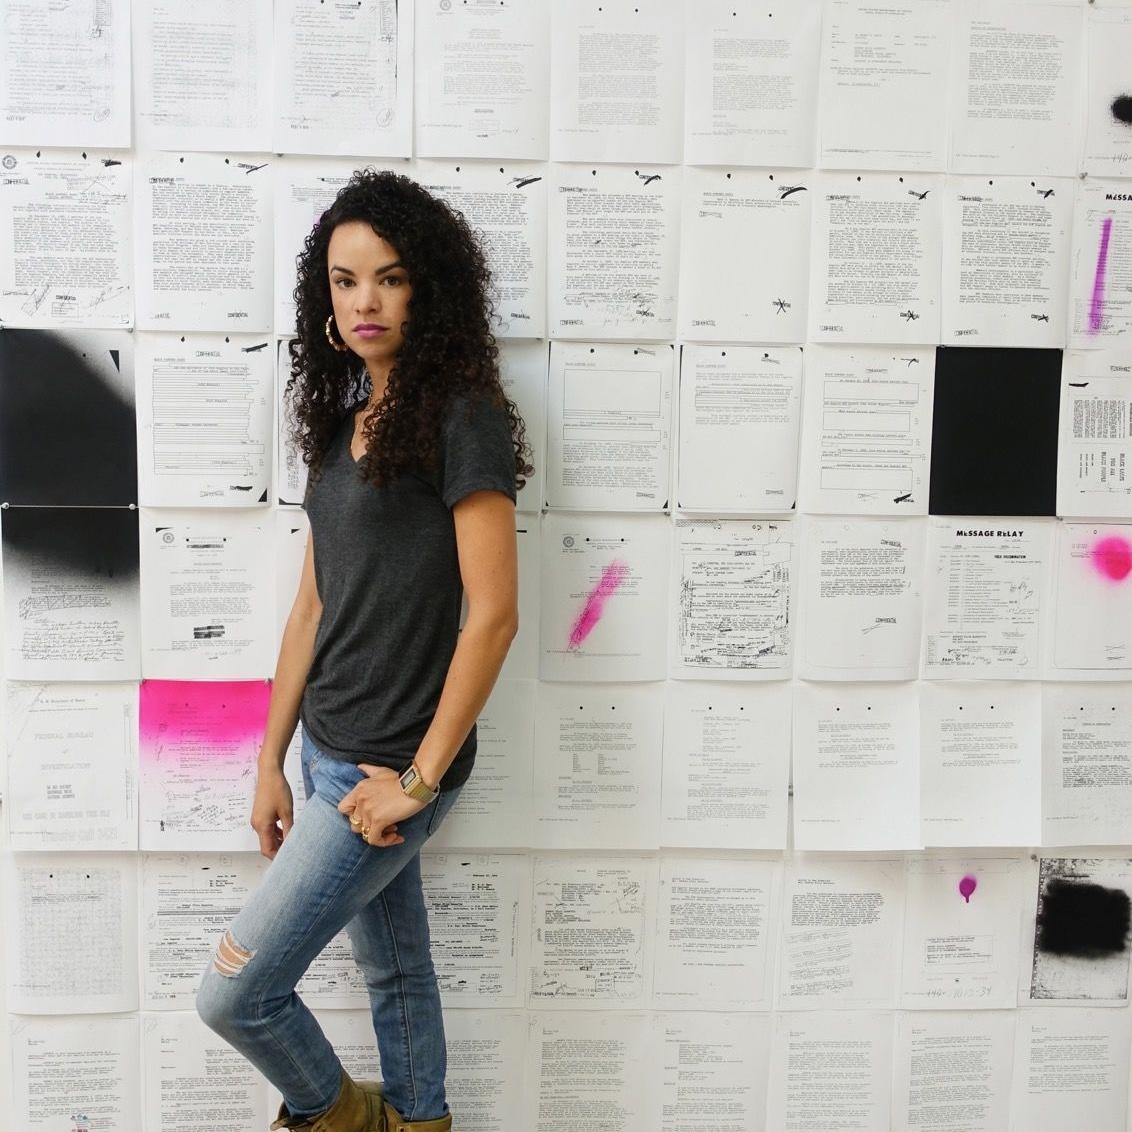 Sadie Barnette Participates in MoMA PS1's Black Forum  November 4, 2018        View more